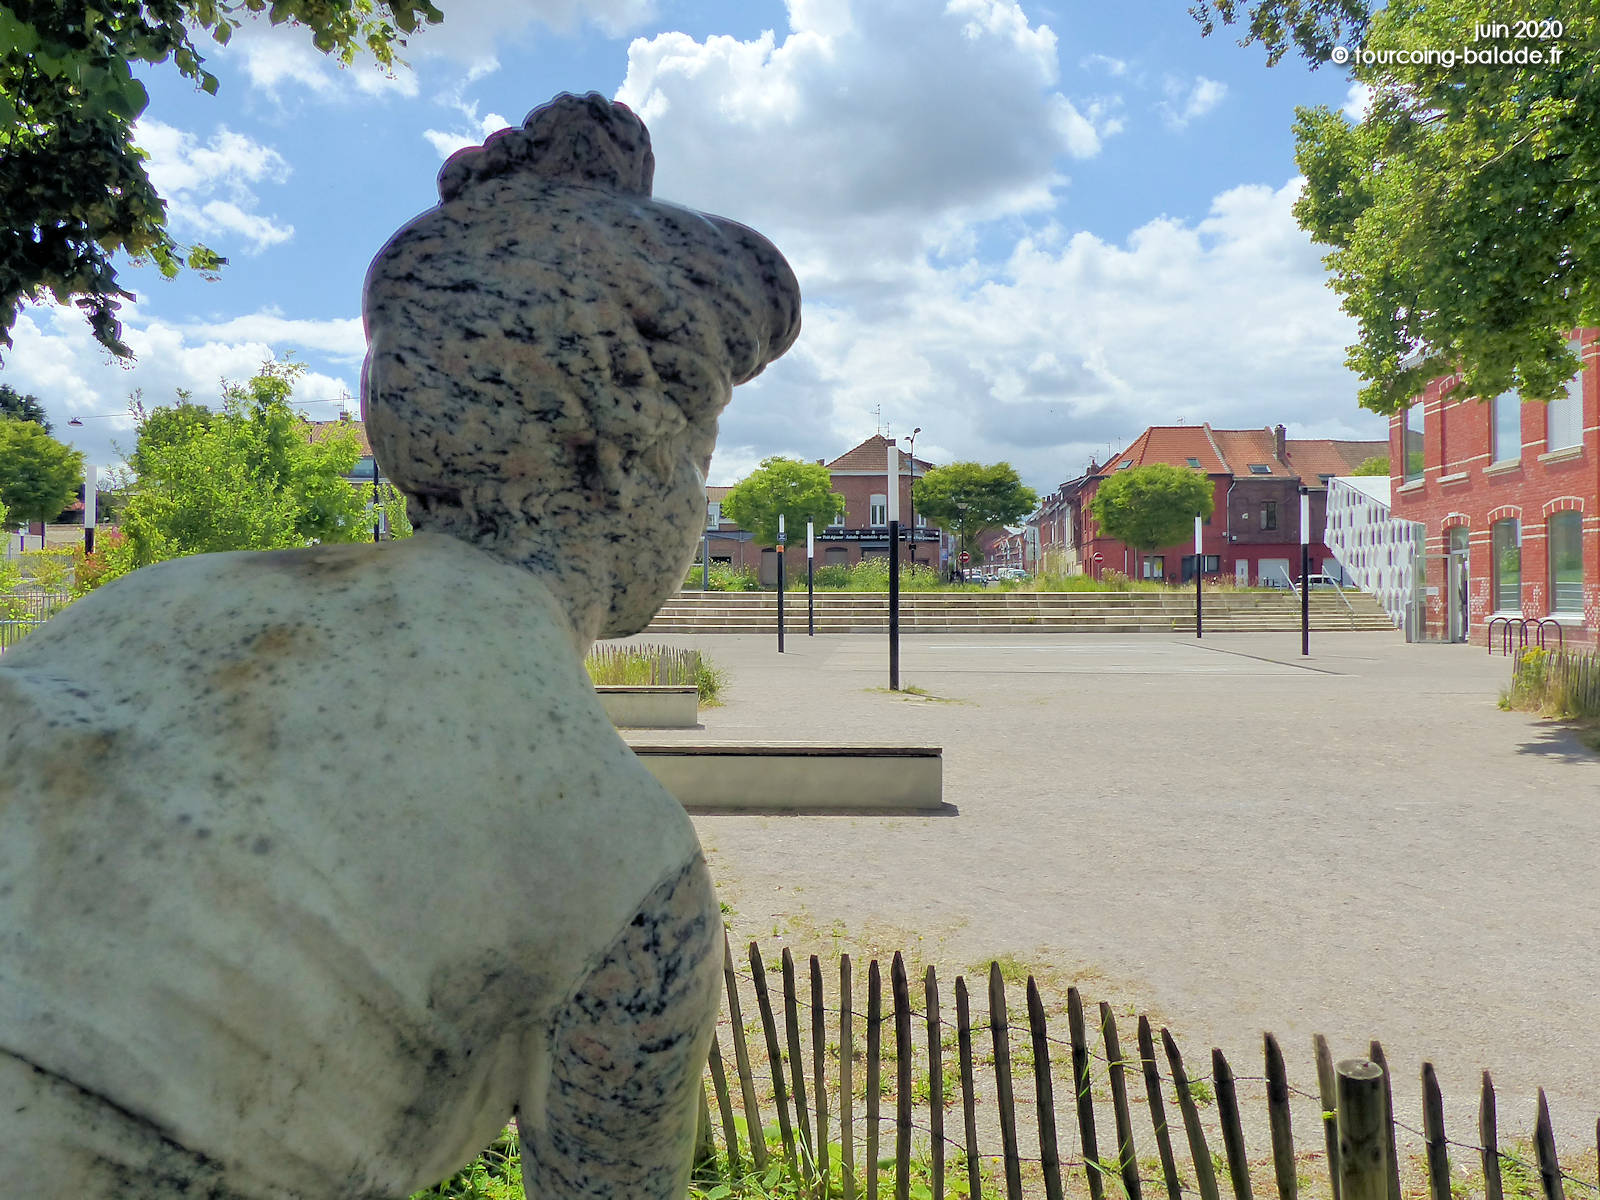 Statue La Penseuse, Tourcoing Belencontre, 2020